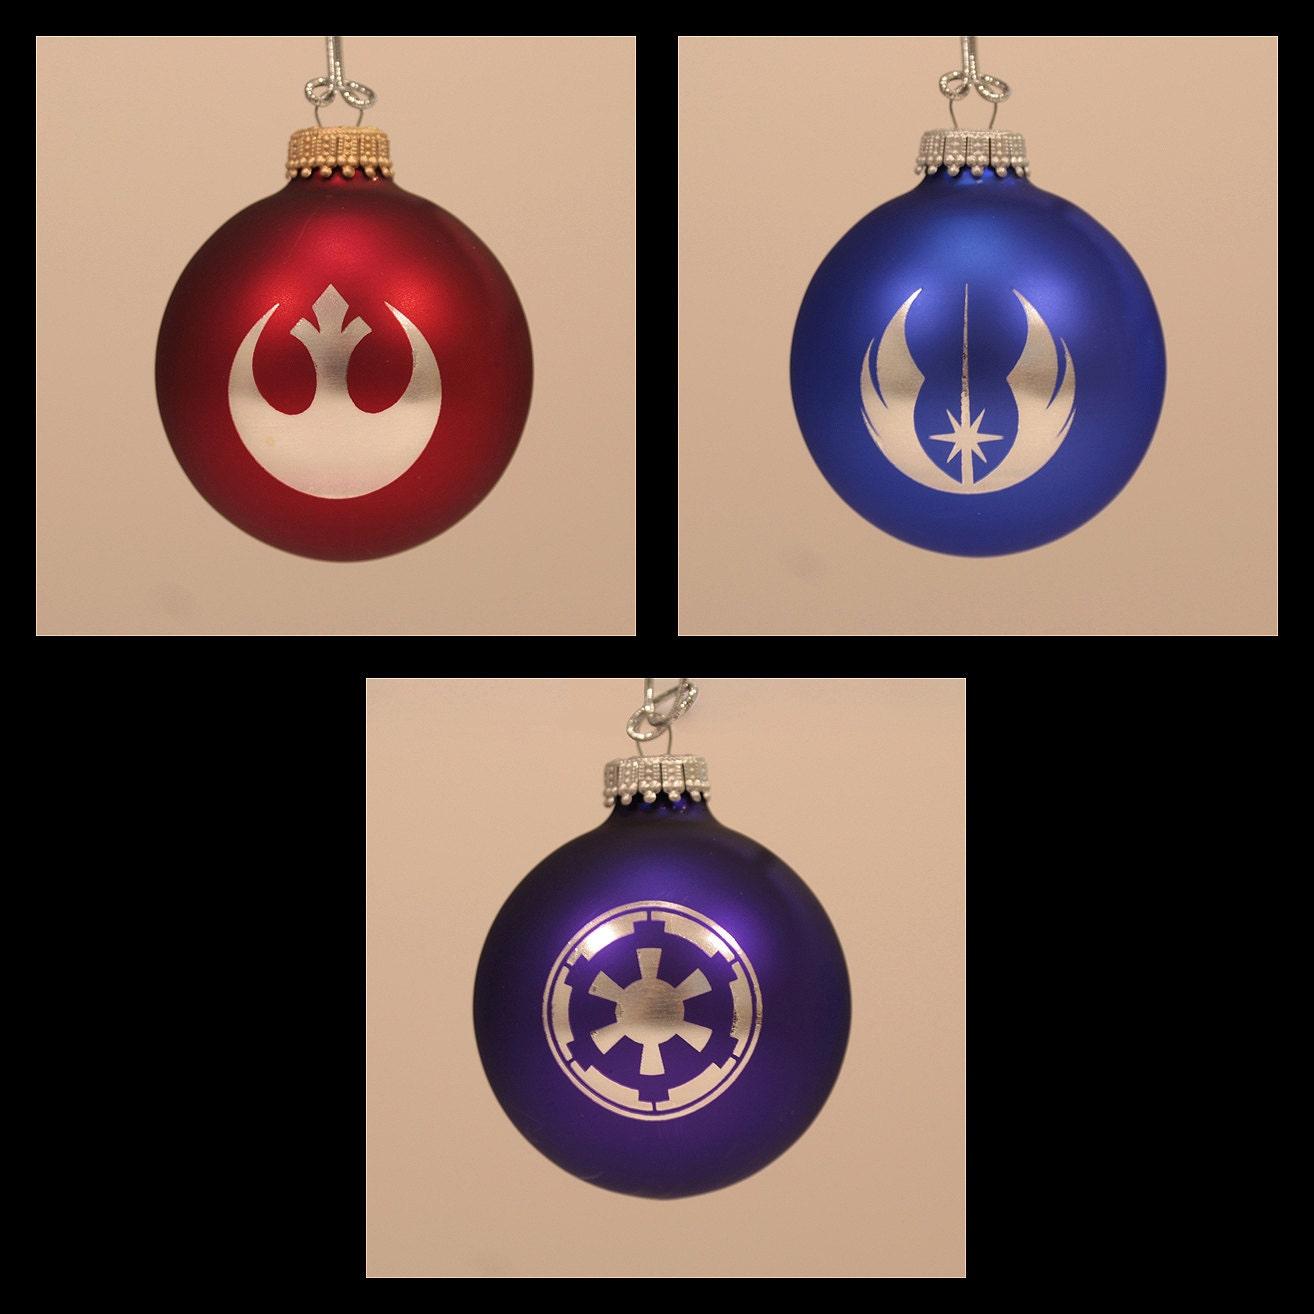 Star Wars Laser Engraved Christmas Ornaments Set Of 3